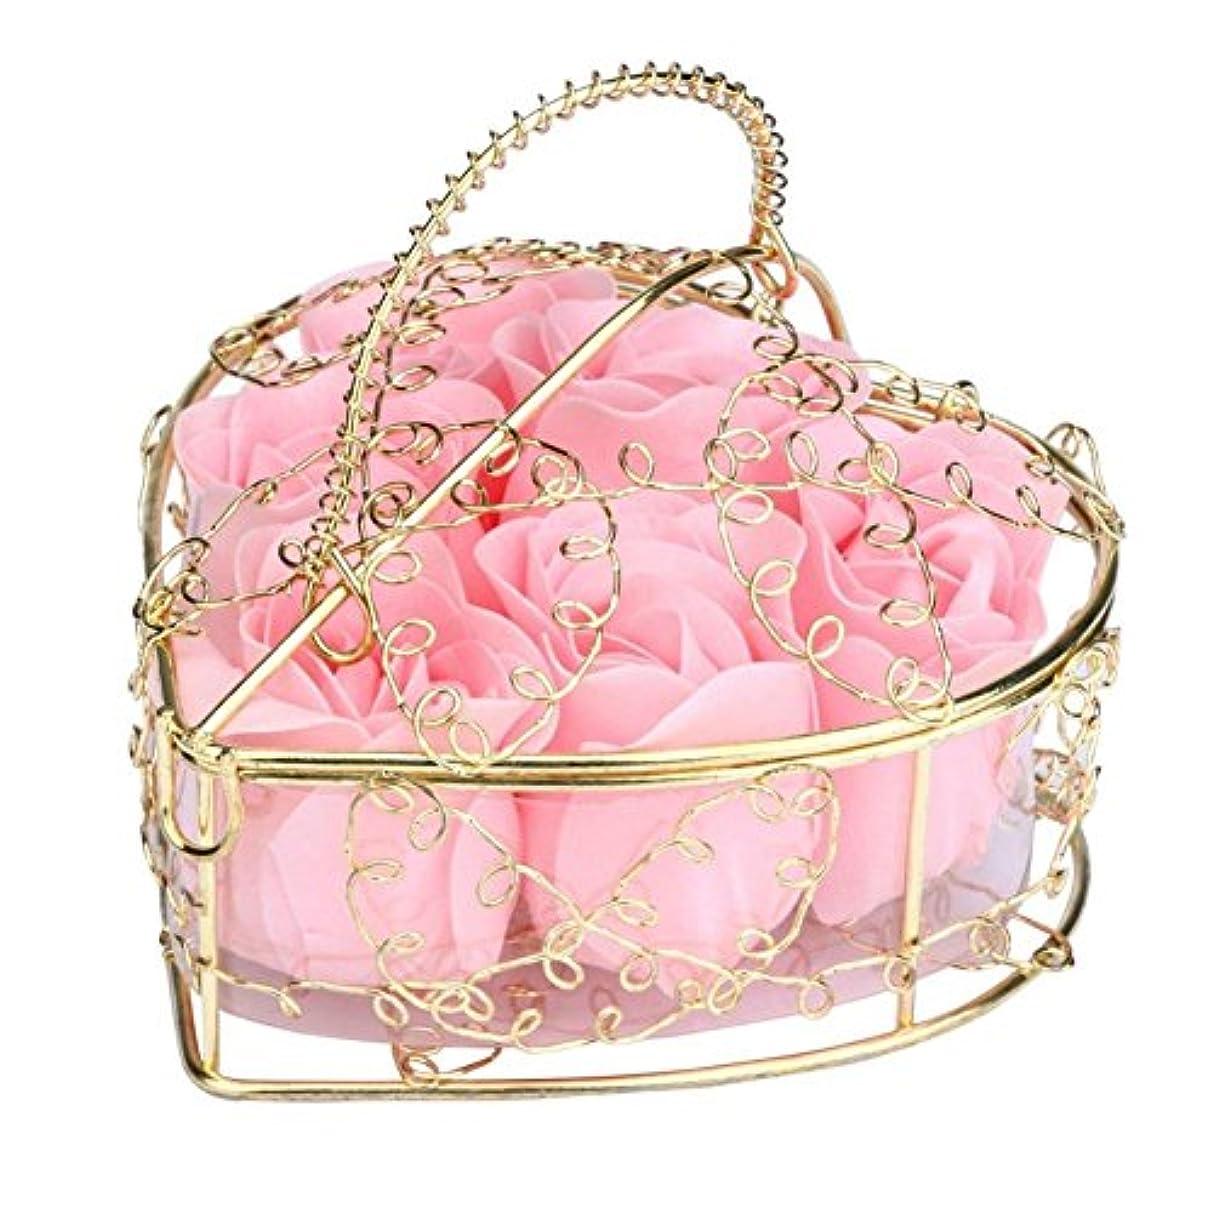 SODIAL 6個の香り付きローズフラワー 花びらバス ボディソープ ウェディングパーティーギフト ホームDIYデコレーション(ピンク)